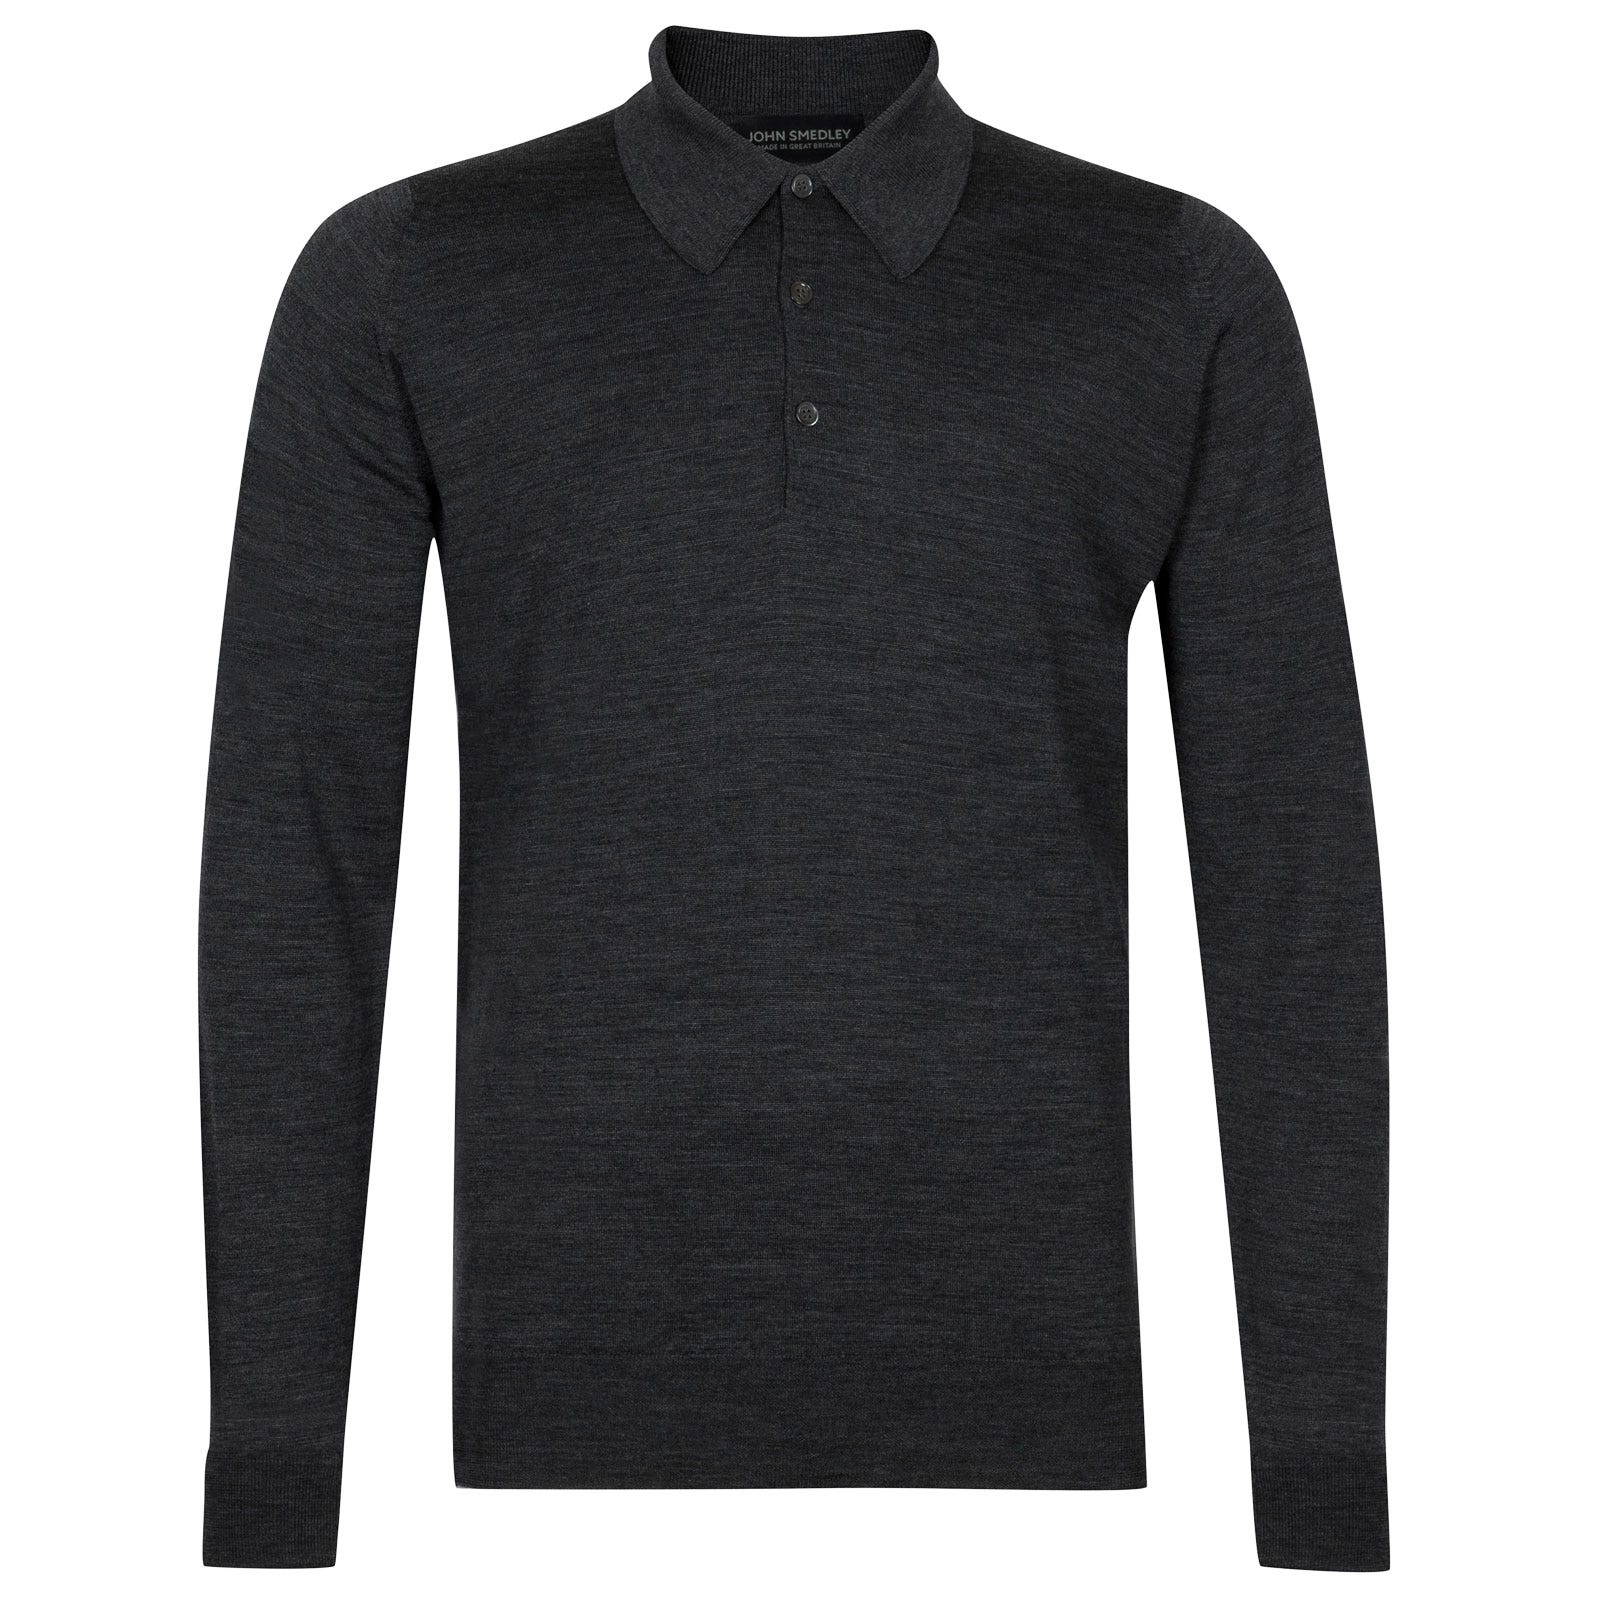 John Smedley dorset Merino Wool Shirt in Charcoal-M